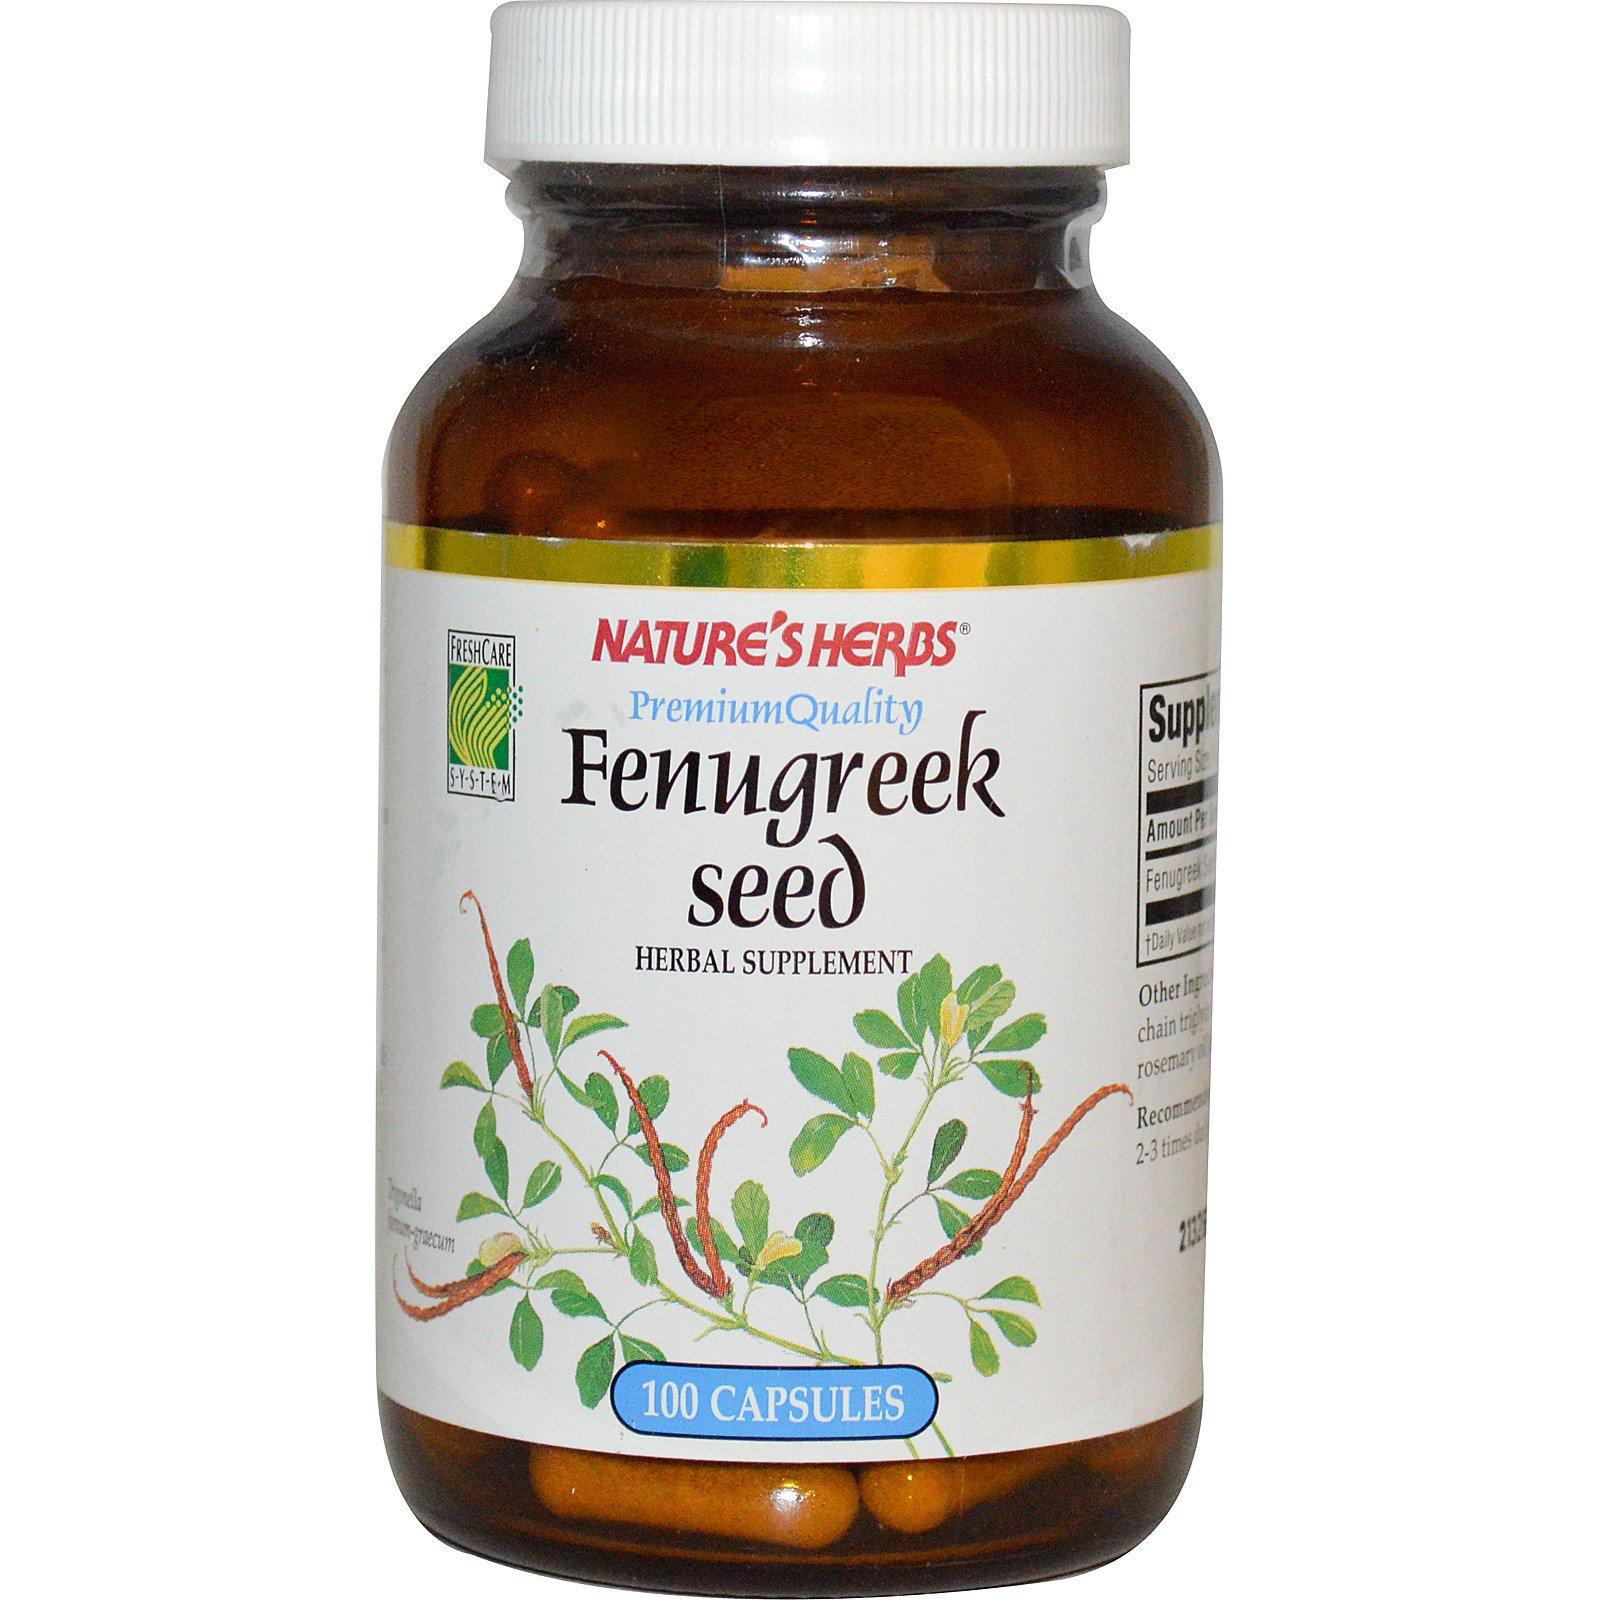 Nature's Herbs, Fenugreek Seed, 100 Capsules (Discontinued Item)